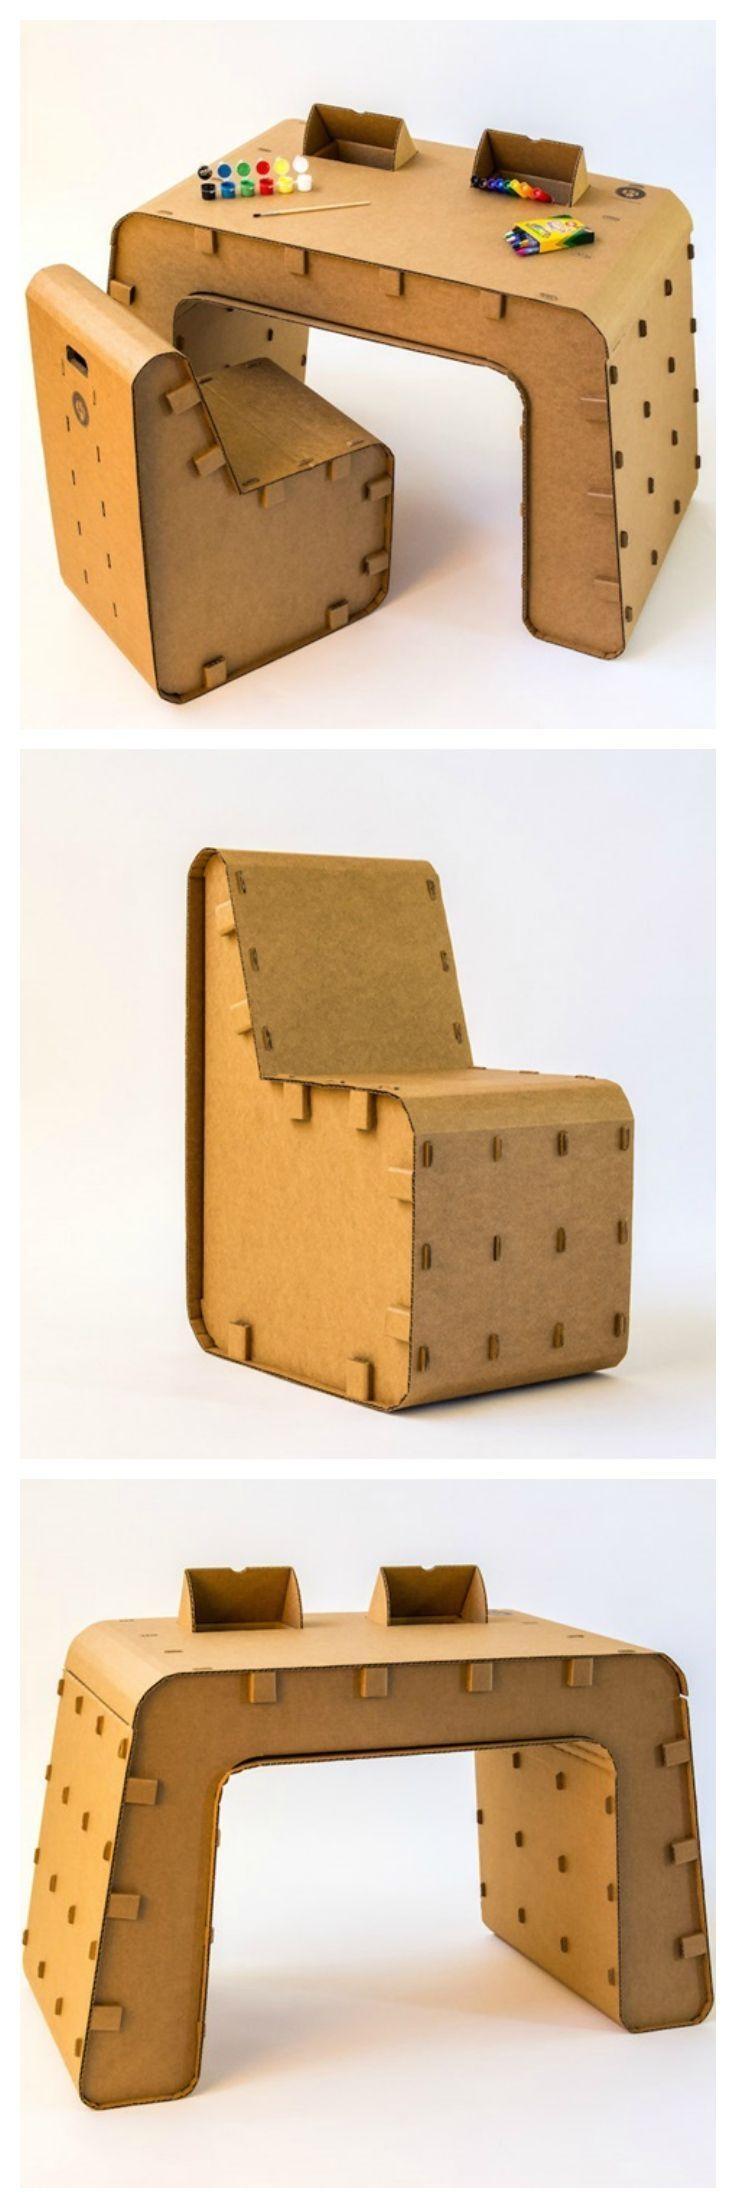 338 Best Cardboard Images On Pinterest | Cardboard Furniture throughout Cardboard Sofas